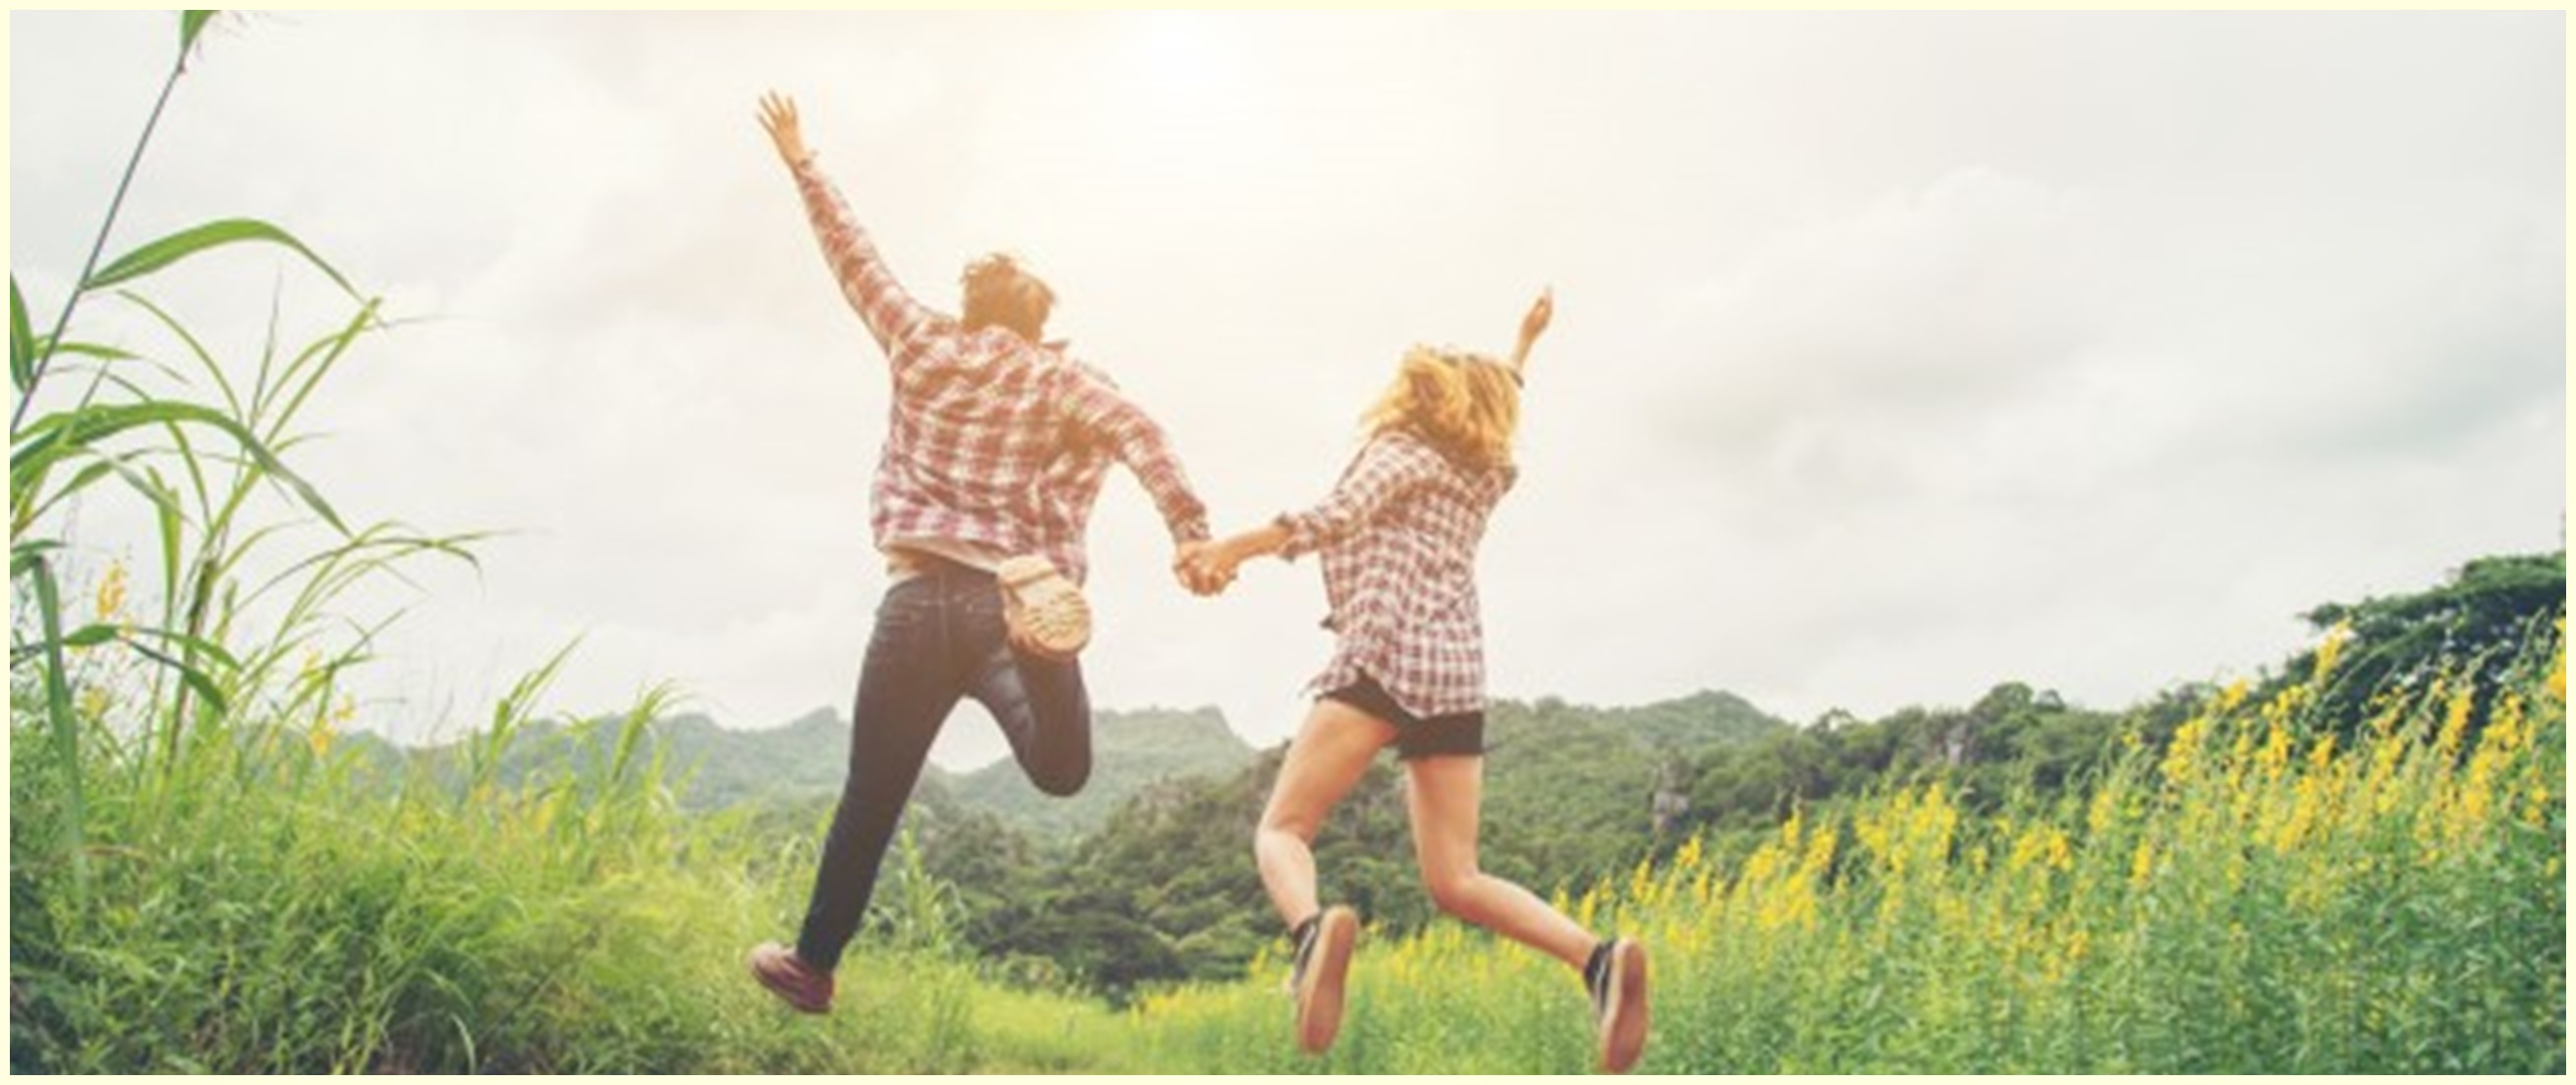 40 Kata-kata caption medsos tentang penyemangat hidup, penuh motivasi